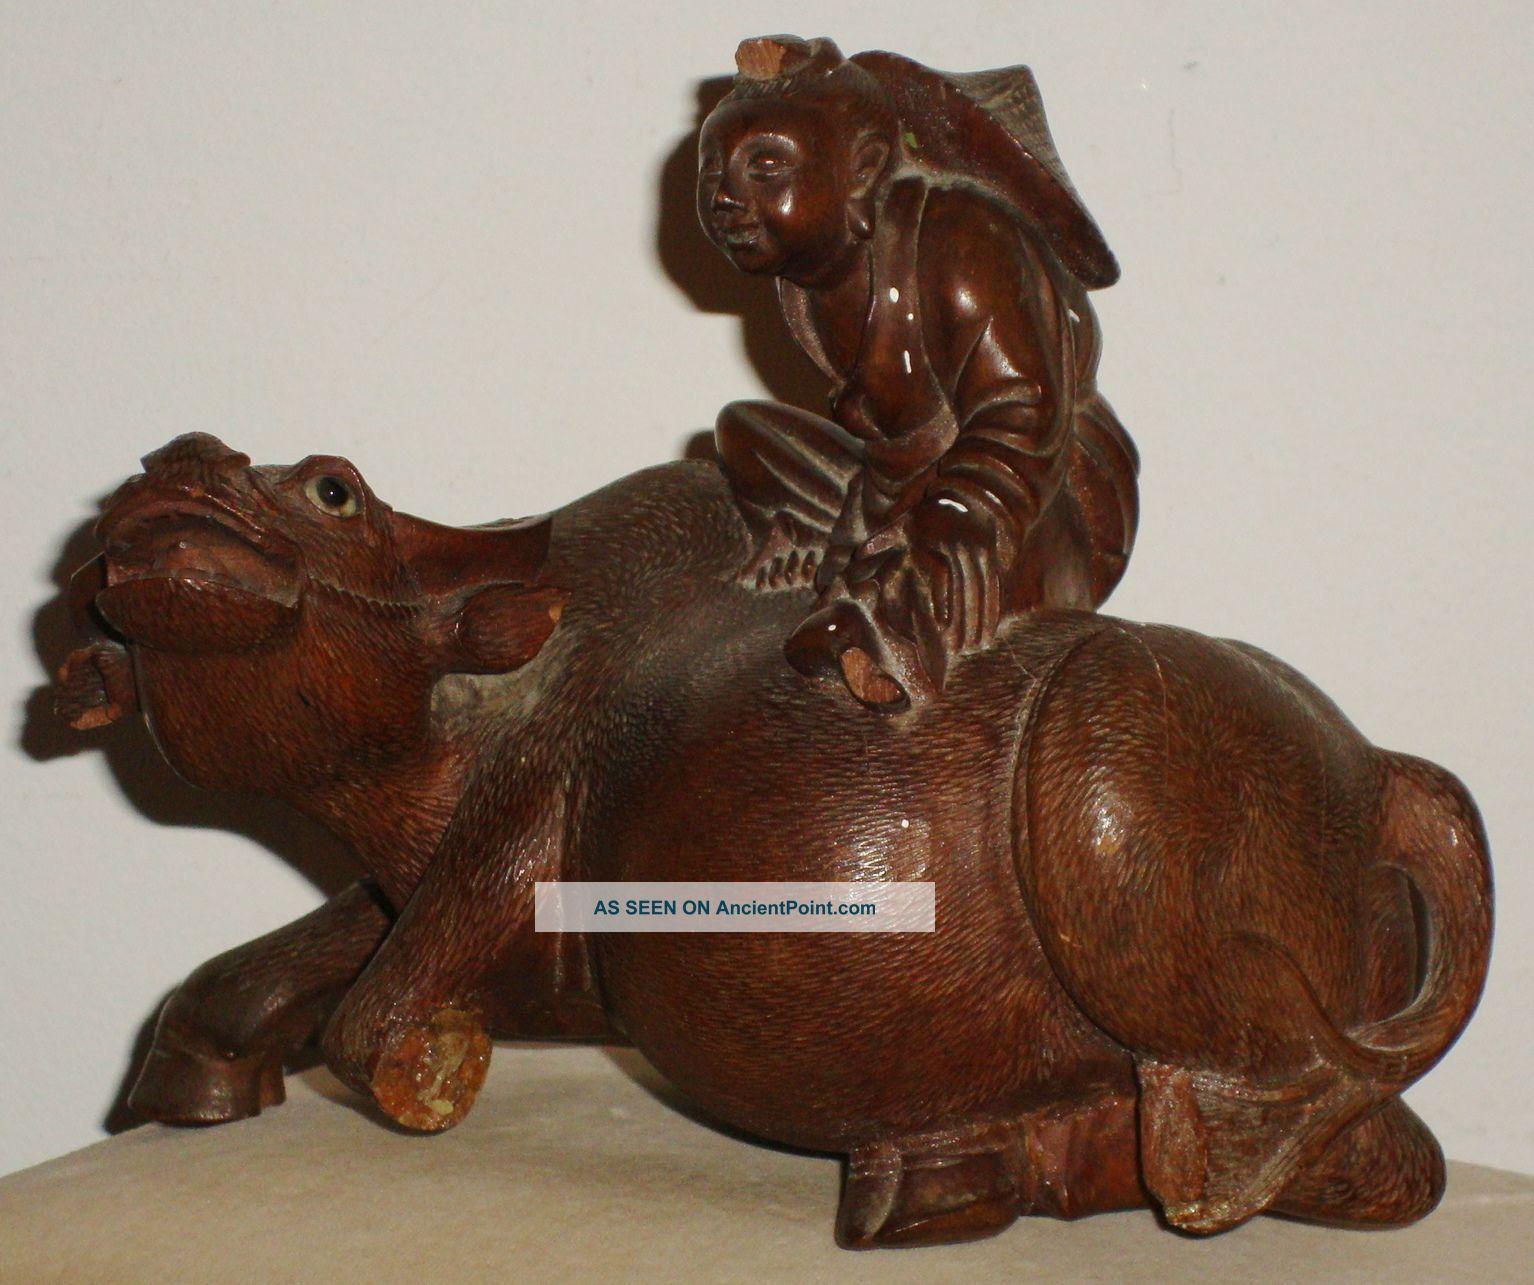 13.  3 Oz.  5x7 Wood Carved Chinese Man Sitting Riding On Ox Figurine Glass Eyes Buddha photo